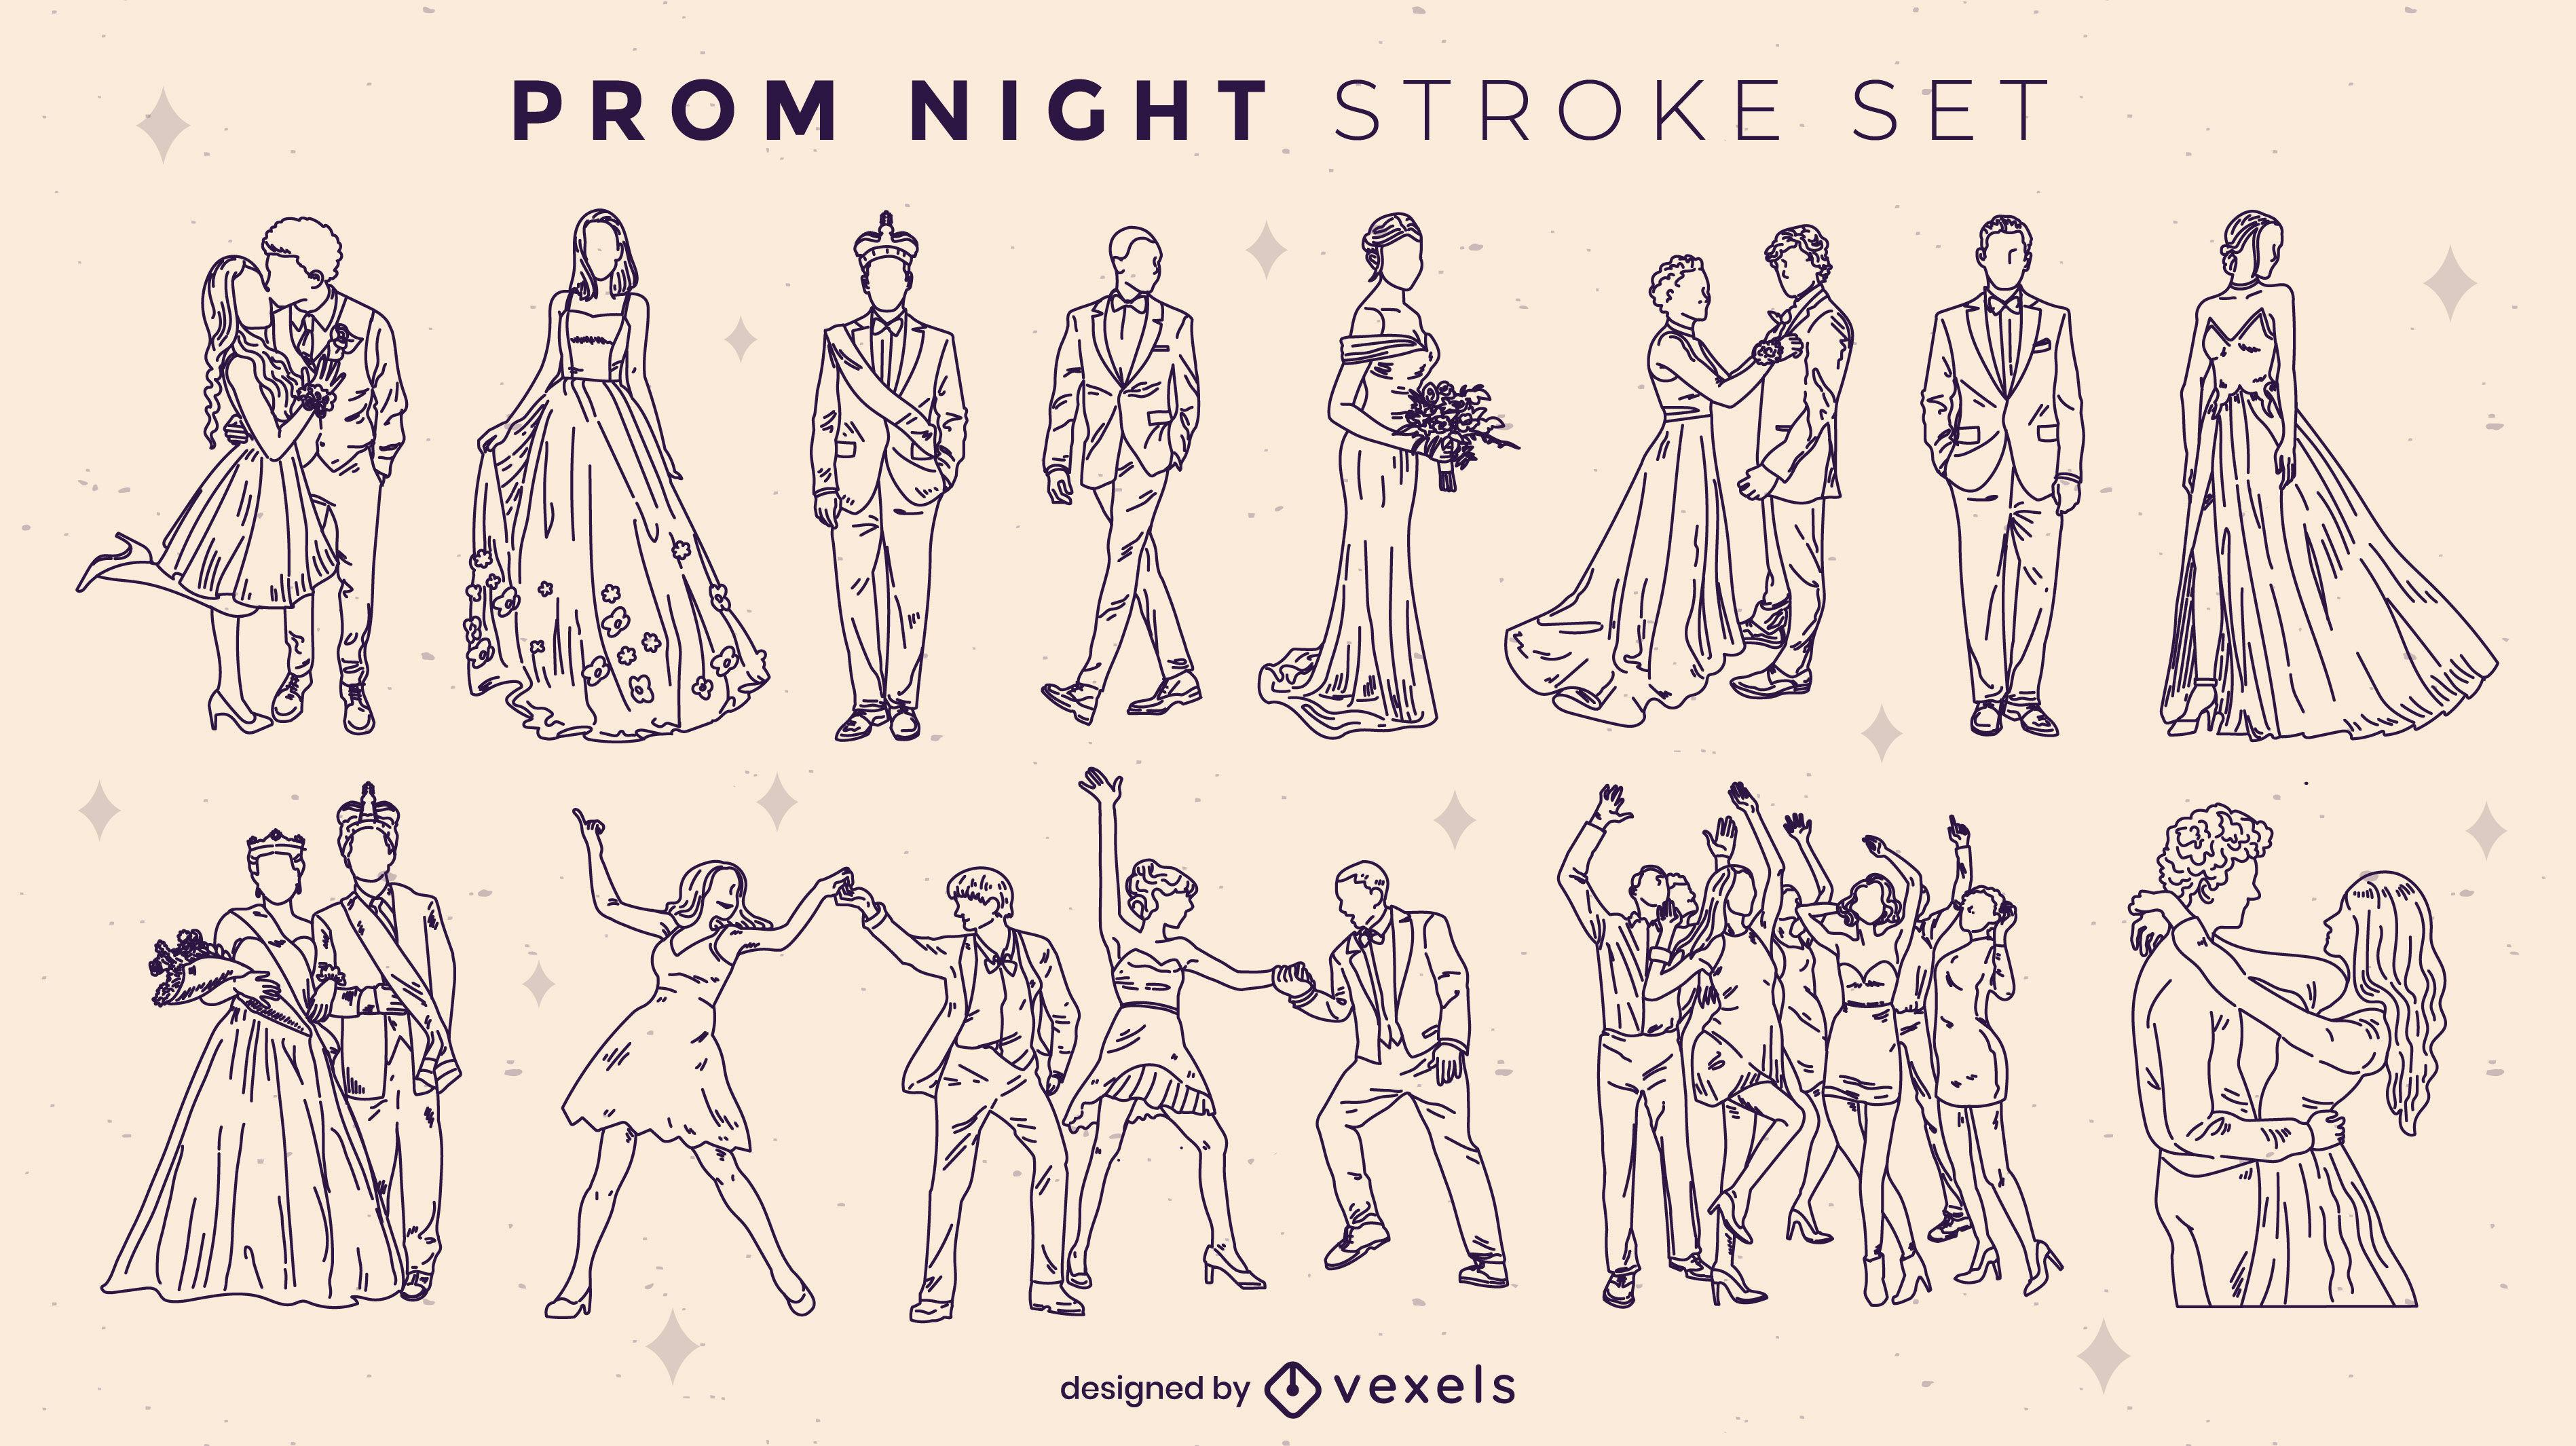 Prom night elements stroke set